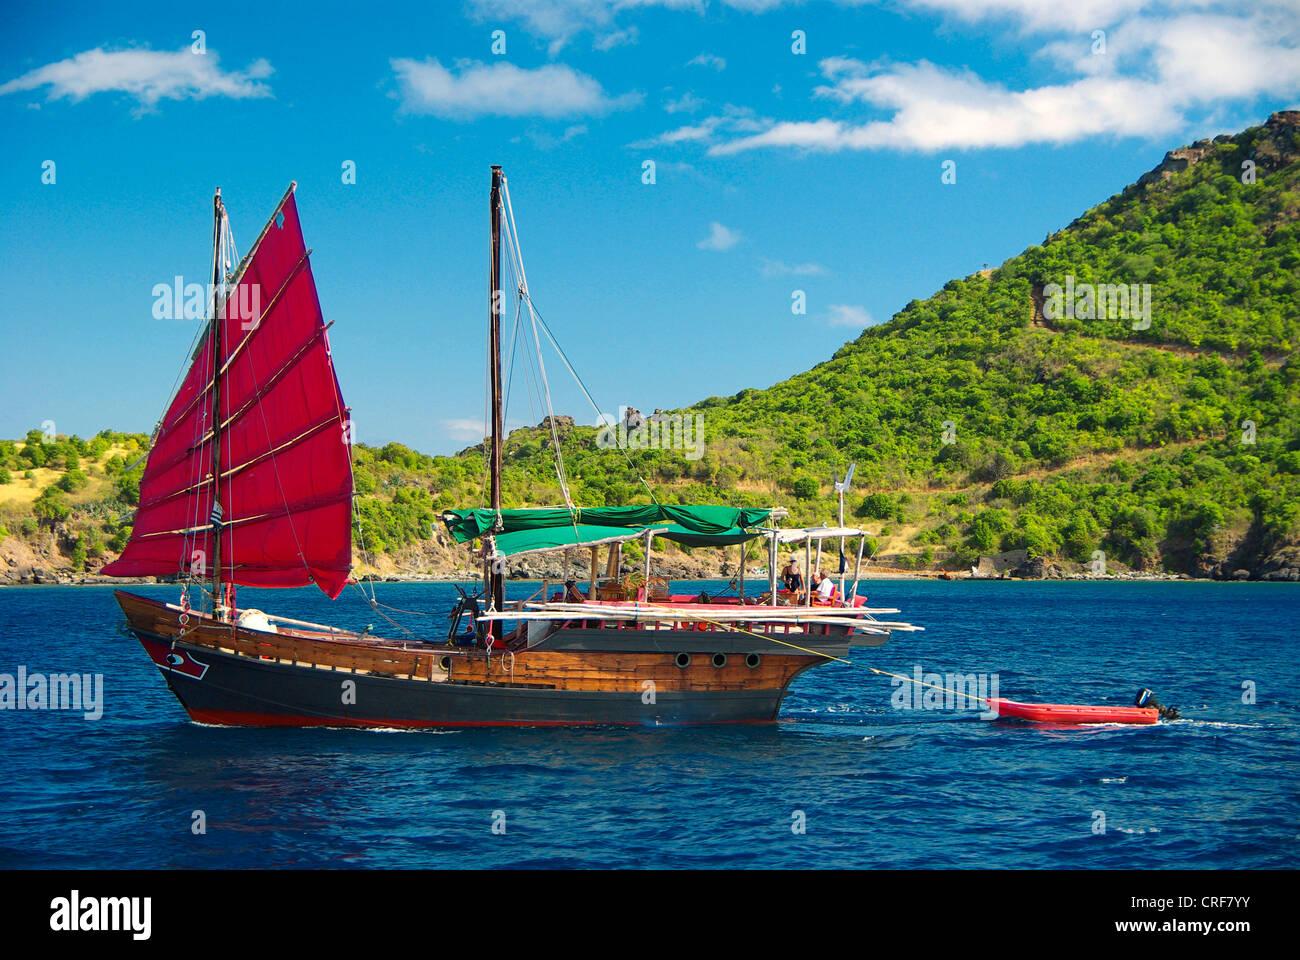 junk at St. Barth, Franzoesische Antillen, Caribbean Sea, Saint-Barthelemy - Stock Image